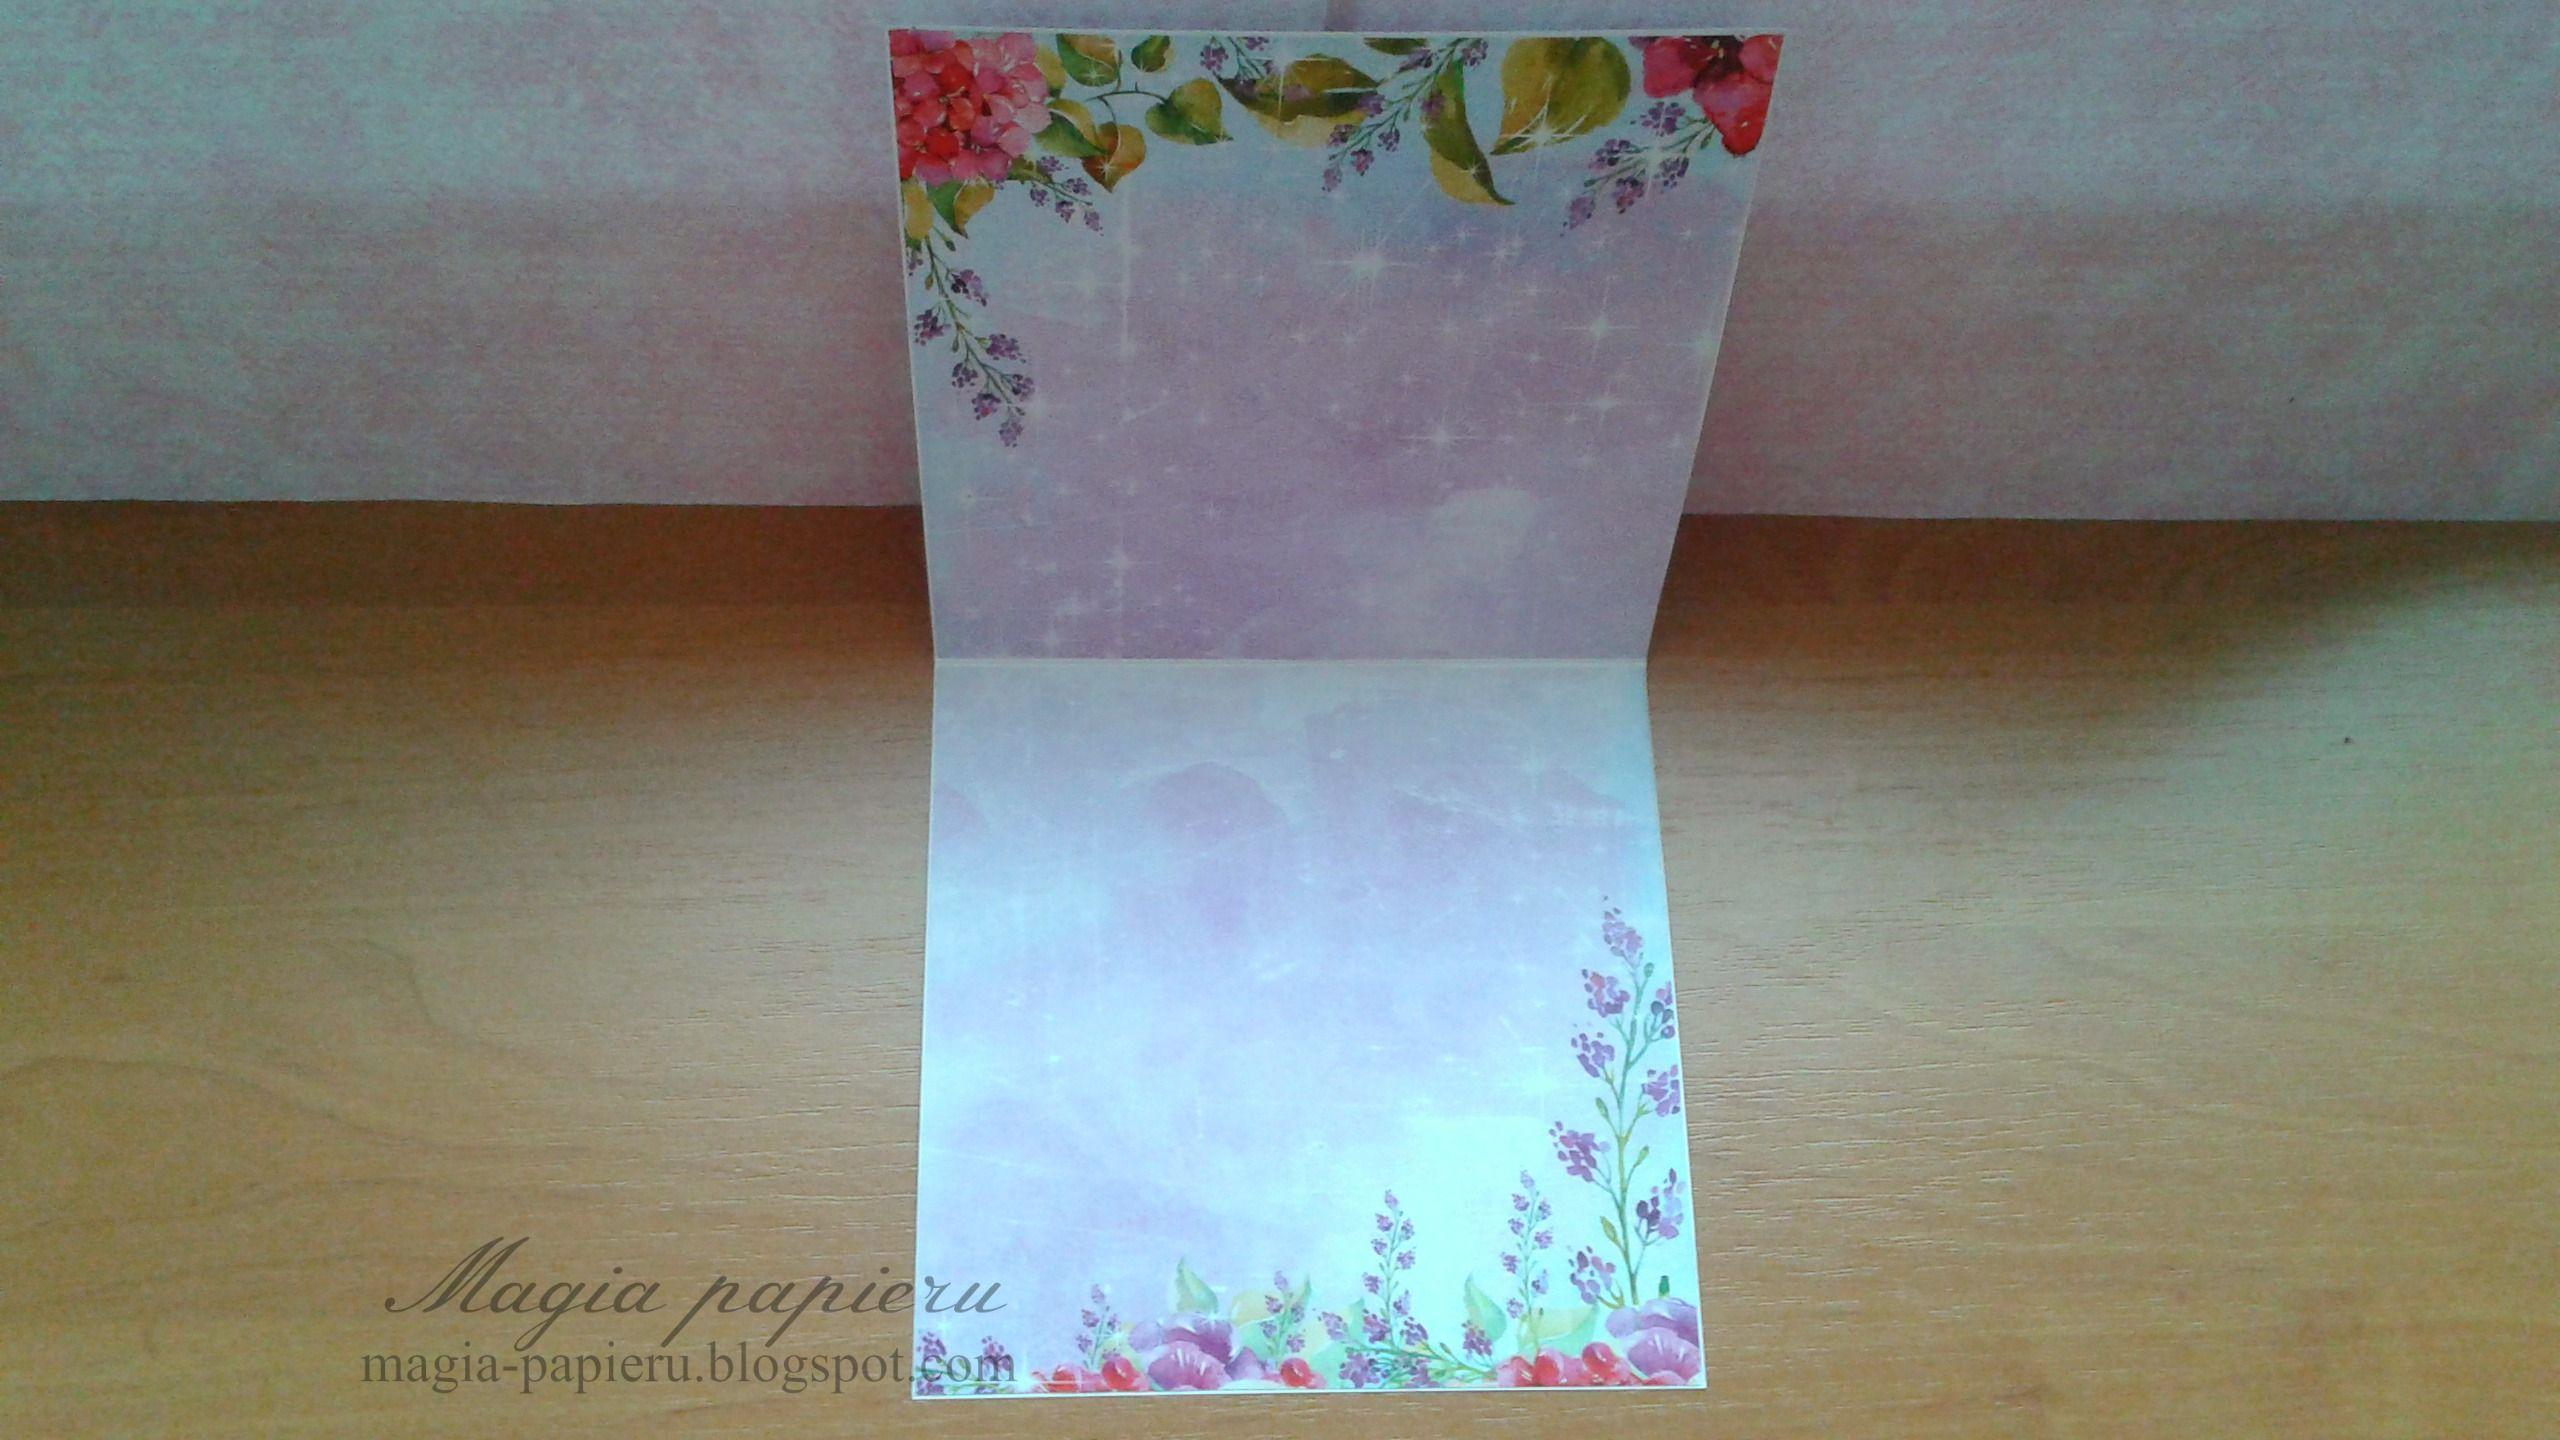 Pin By Magia Papieru On Kartki Urodzinowe Scrapbooking Kartki